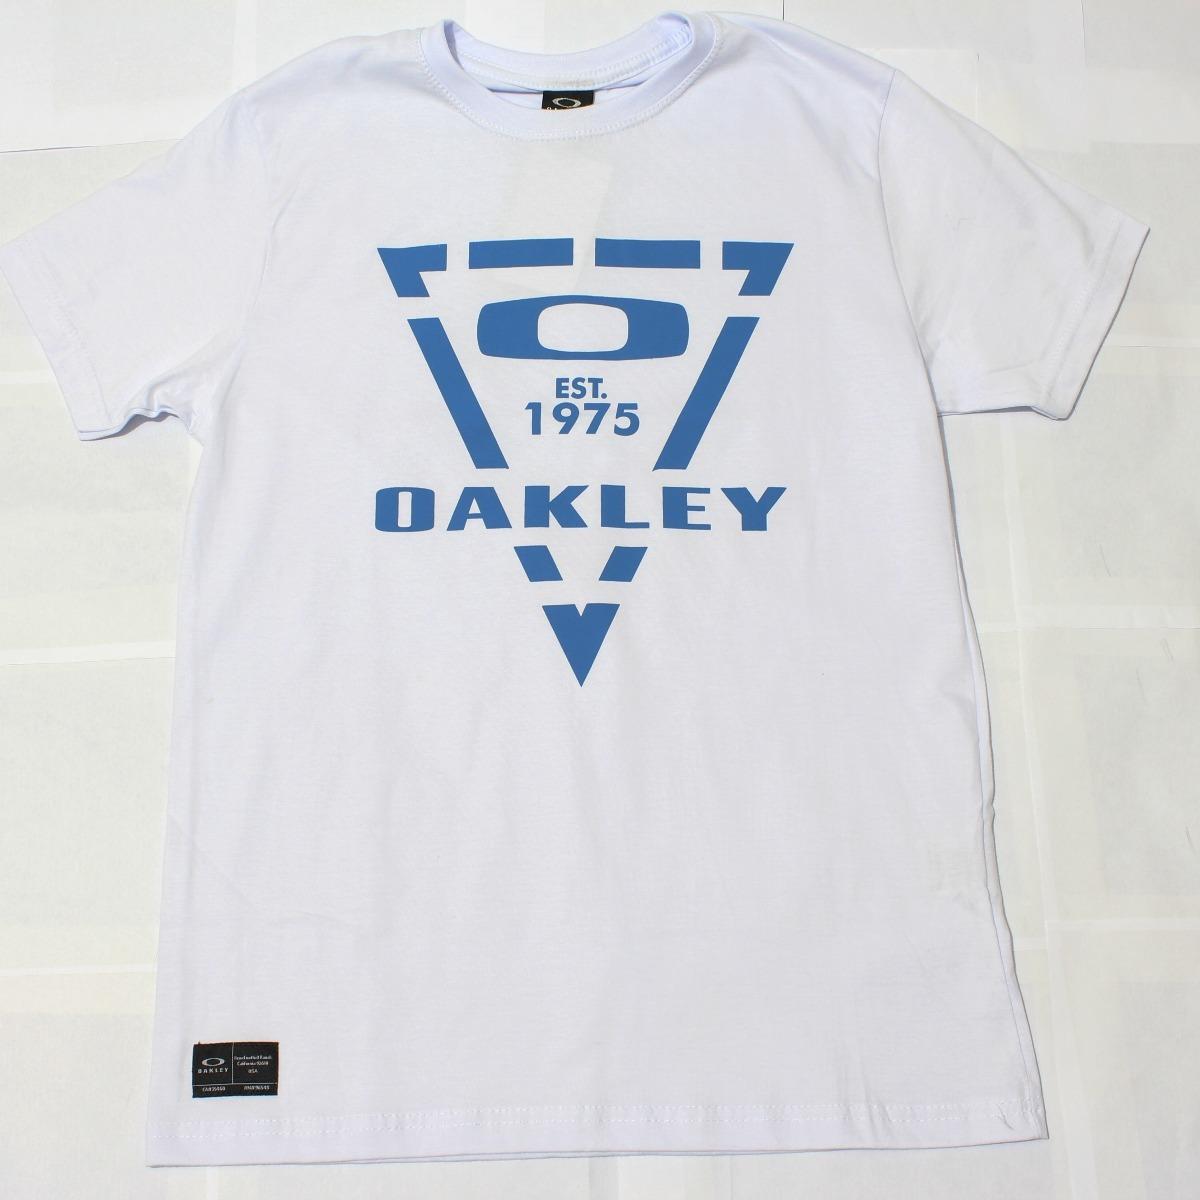 76d1815ae3953 Camiseta Oakley Manga Curta Estampada (surf)